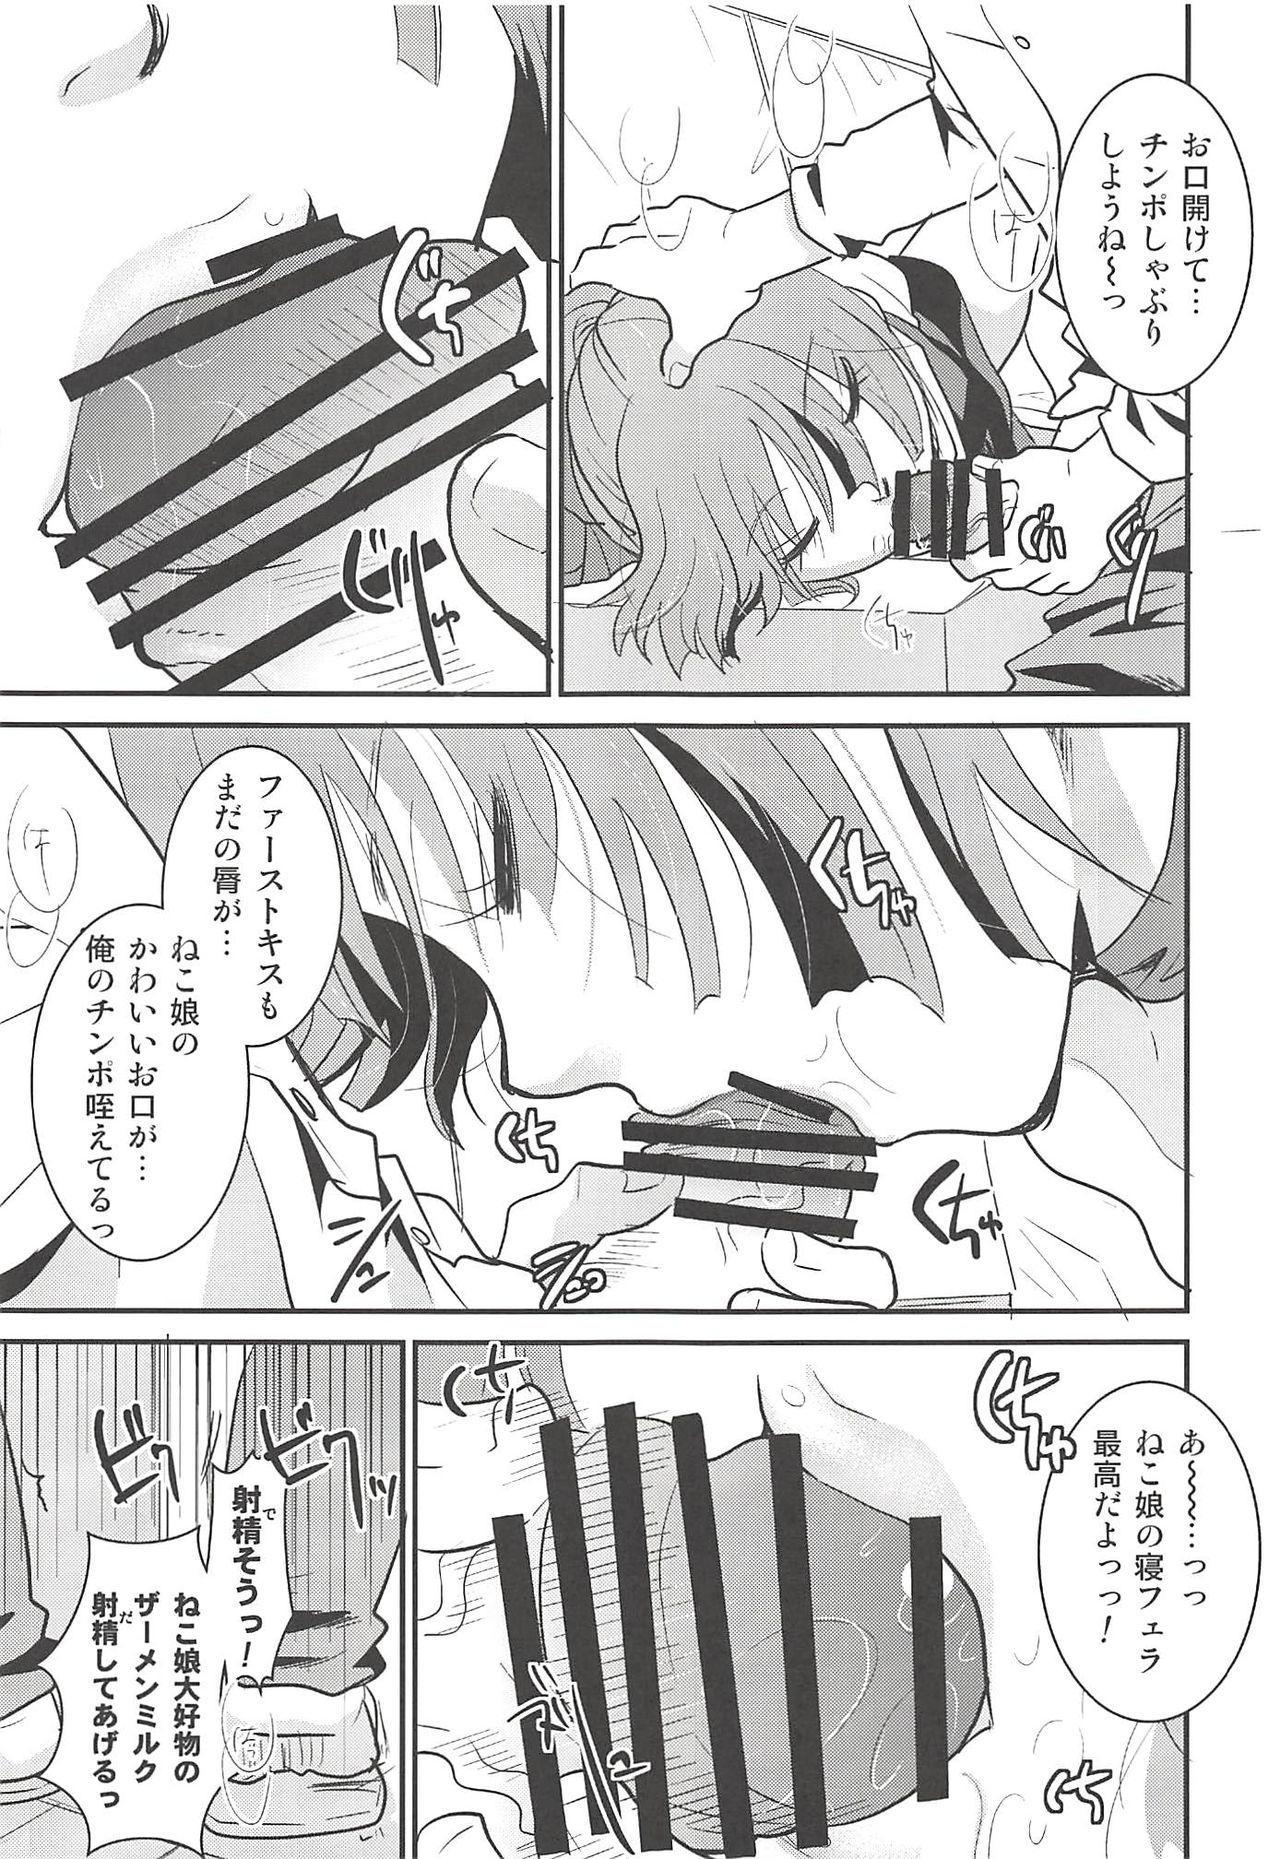 Neko Musume Suikan 15